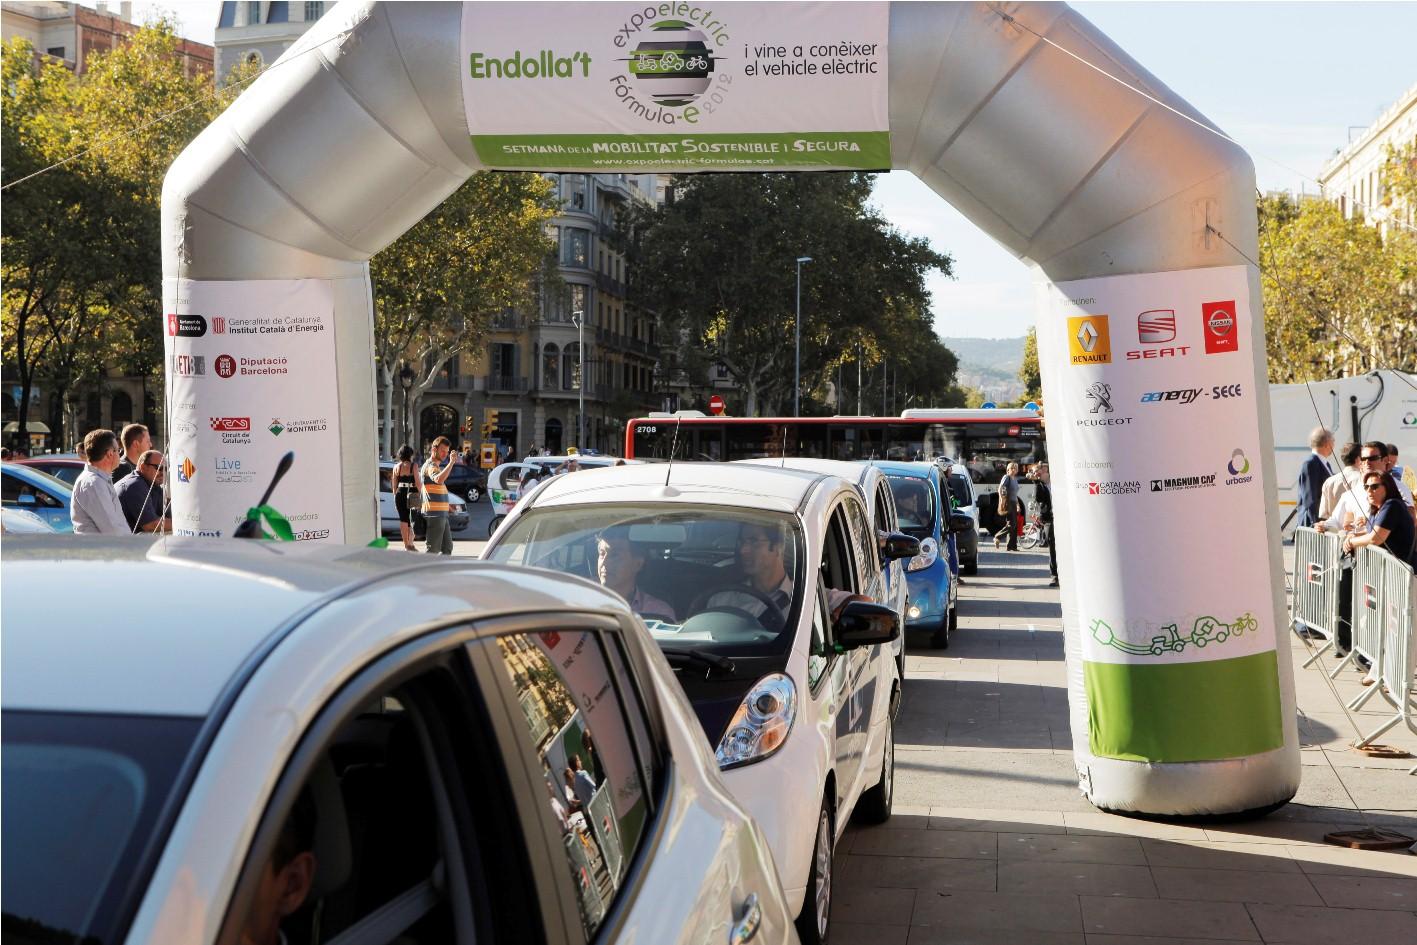 https://www.evwind.com/wp-content/uploads/2012/09/coche-el%C3%A9ctrico-BCN.jpg